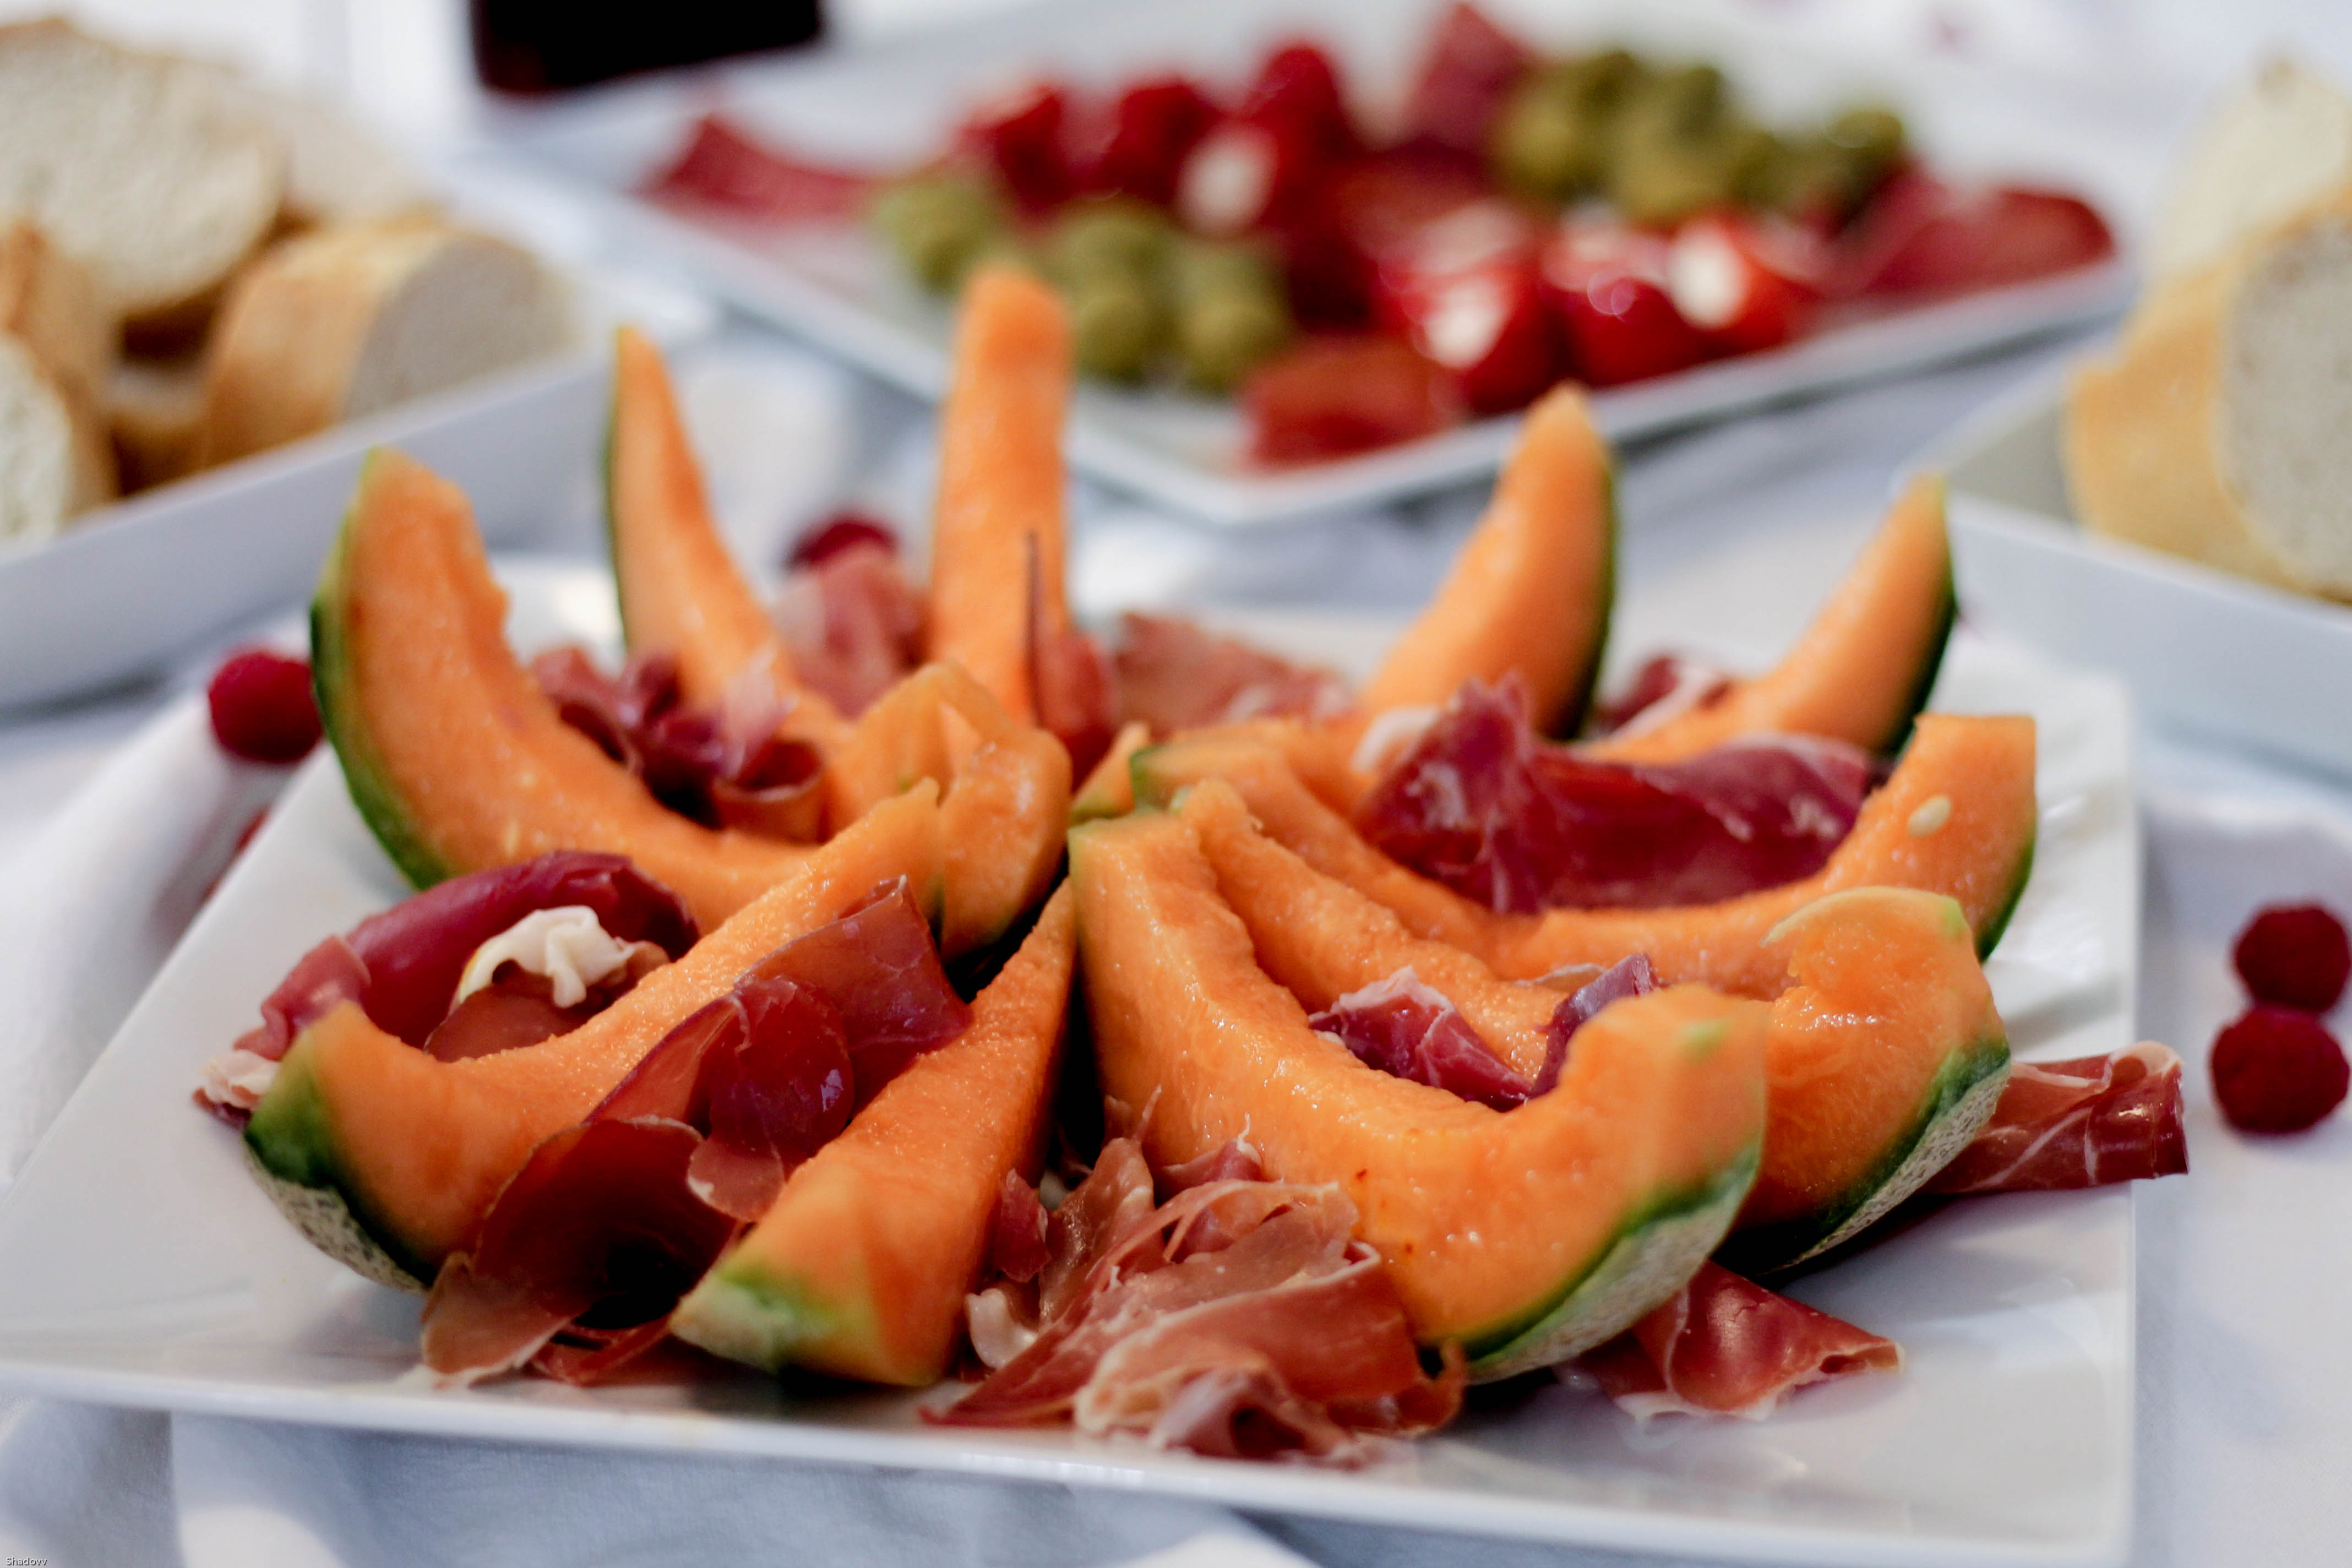 food friday kardiaserena #7Geschmackswelten antipasti serano